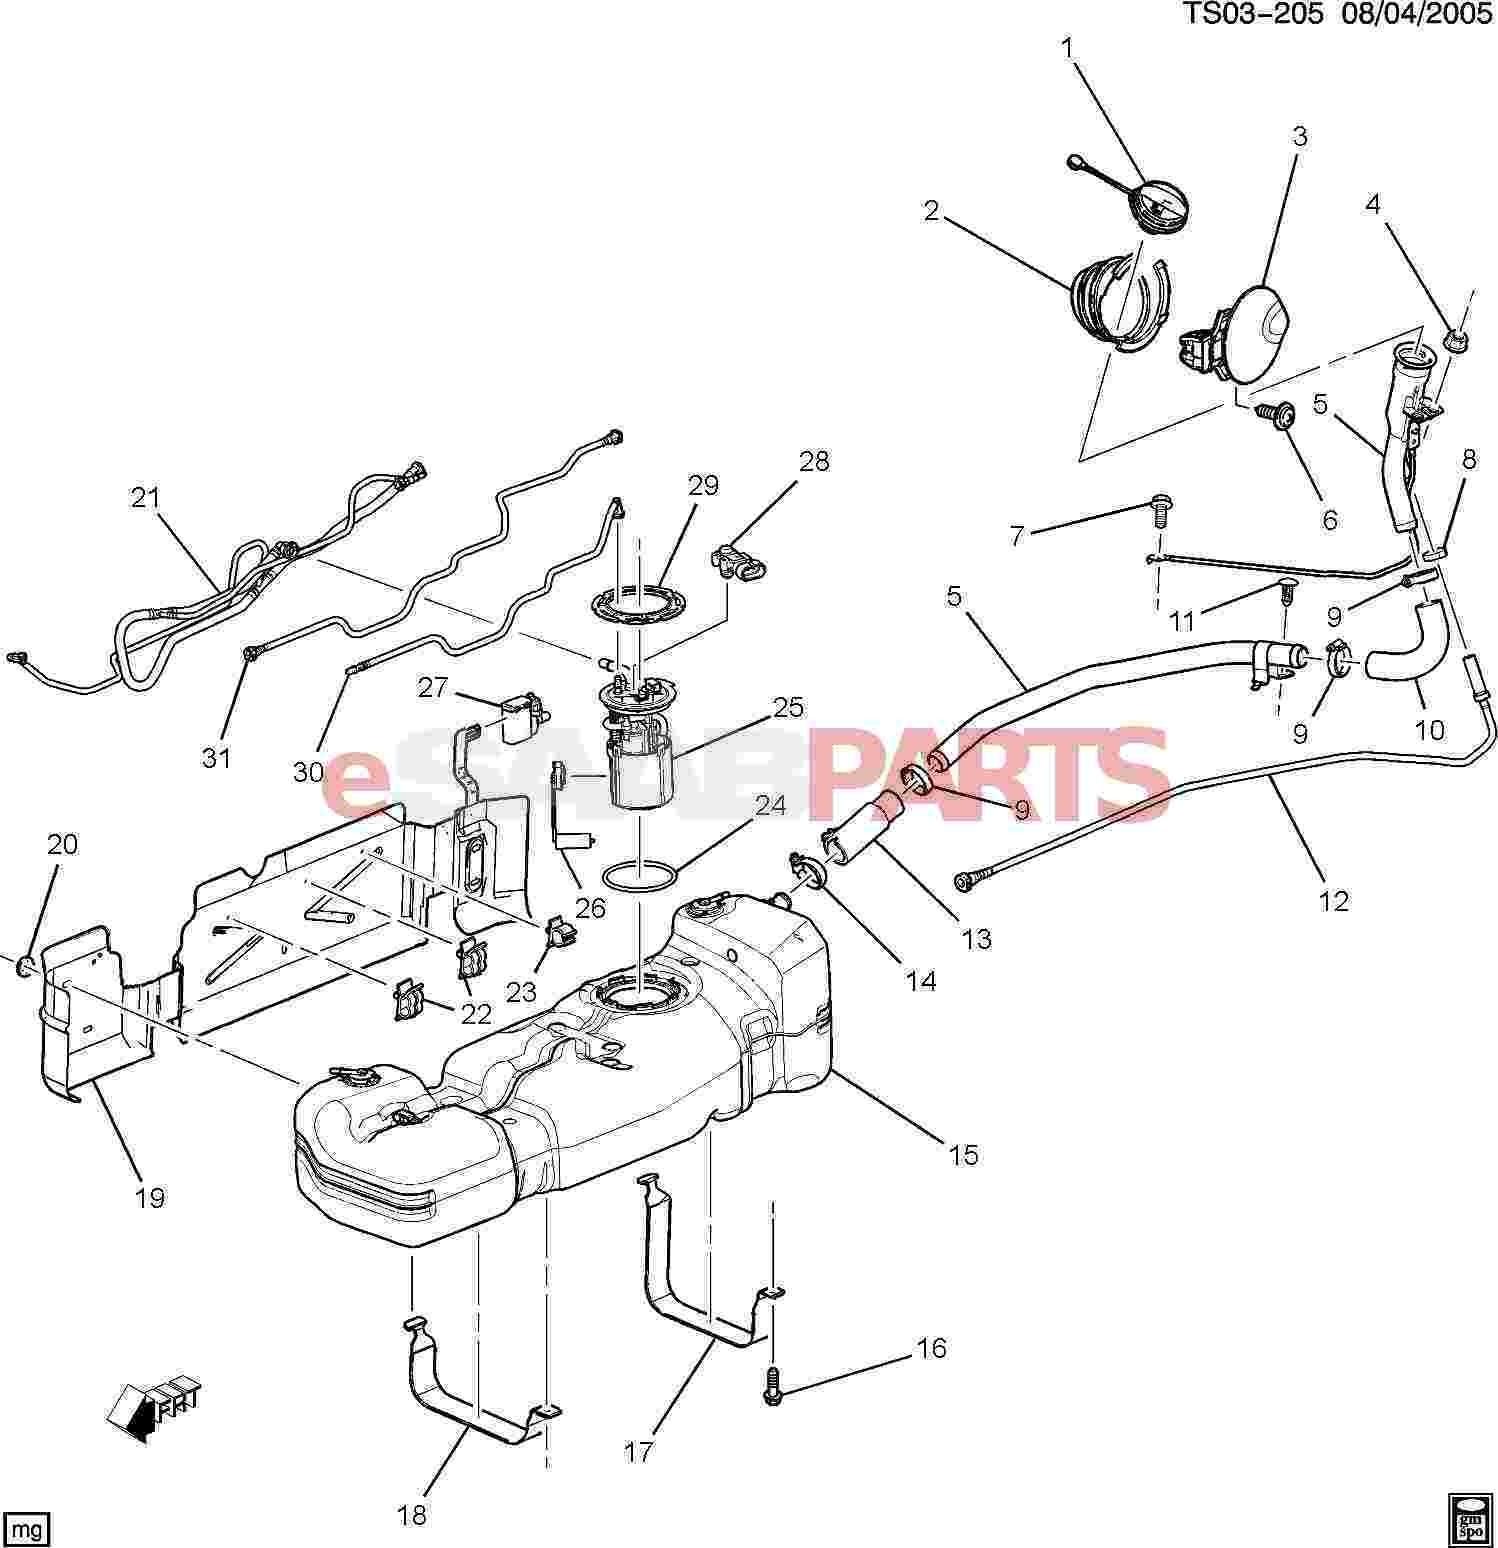 Gmc Envoy Parts Diagram ] Saab Nut Hfh M6x1 5 85thk 14 2 O D 10 Zor Genuine Of Gmc Envoy Parts Diagram